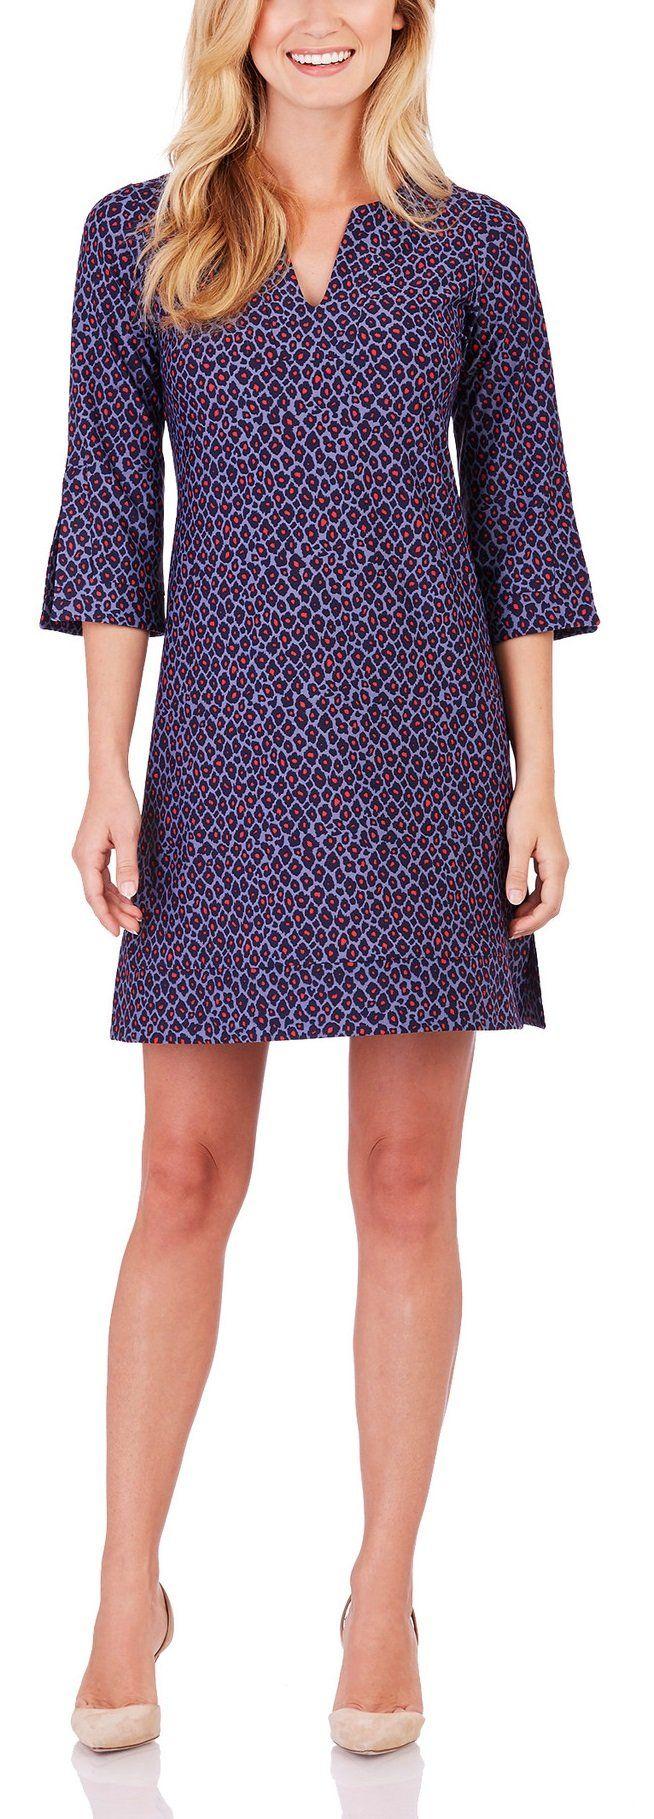 Jude Connally Megan 3/4 Tunic Dress in Mini Cheetah Crimson (Medium). V-neckline. 3/4 sleeve. Venting on hemline and sleeve. Nylon/spandex. Machine wash only. Do not bleach Cool iron if necessary.